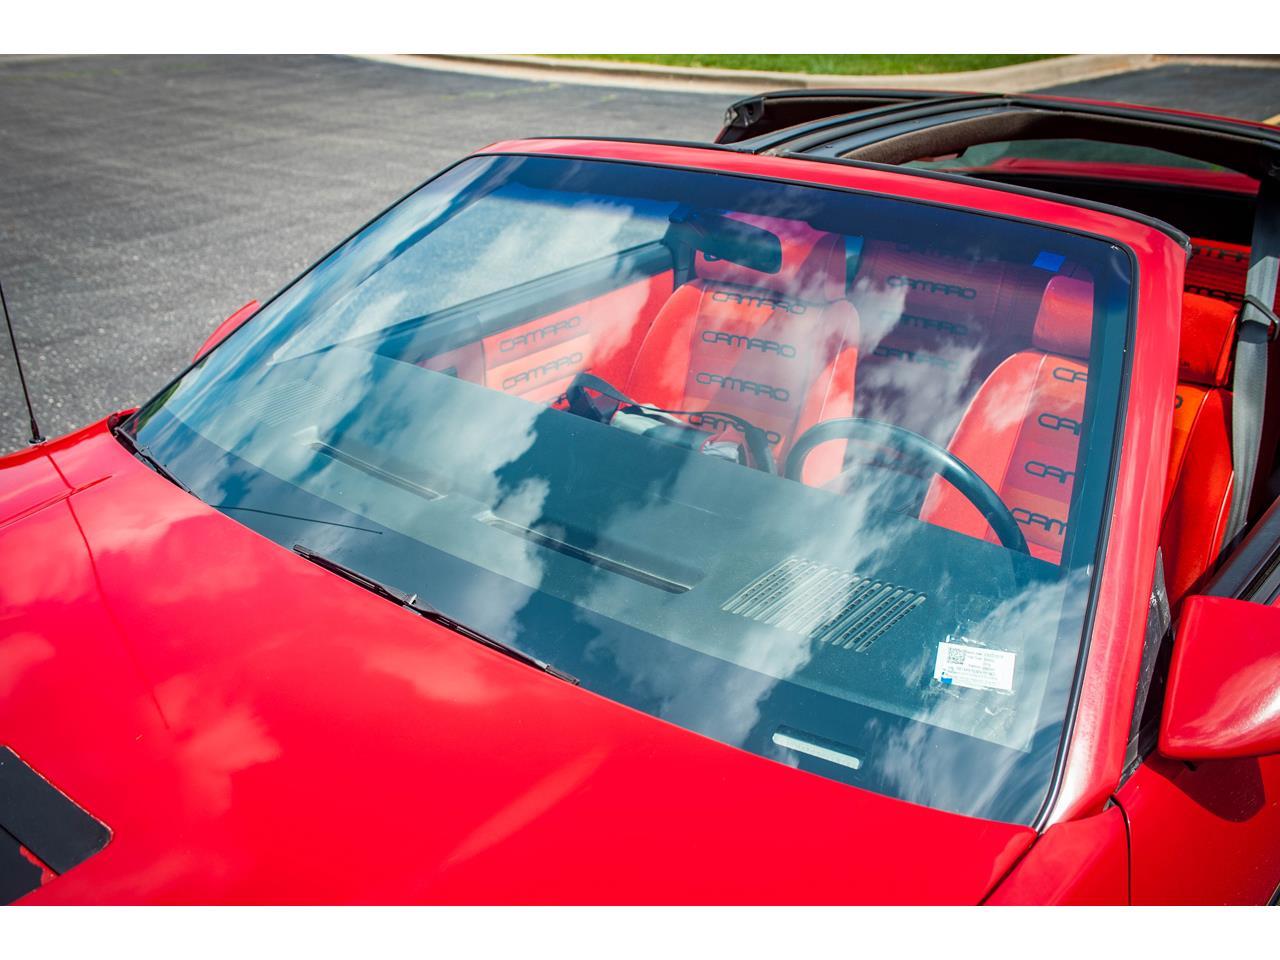 Large Picture of 1984 Camaro located in O'Fallon Illinois - $9,500.00 - QB9Y